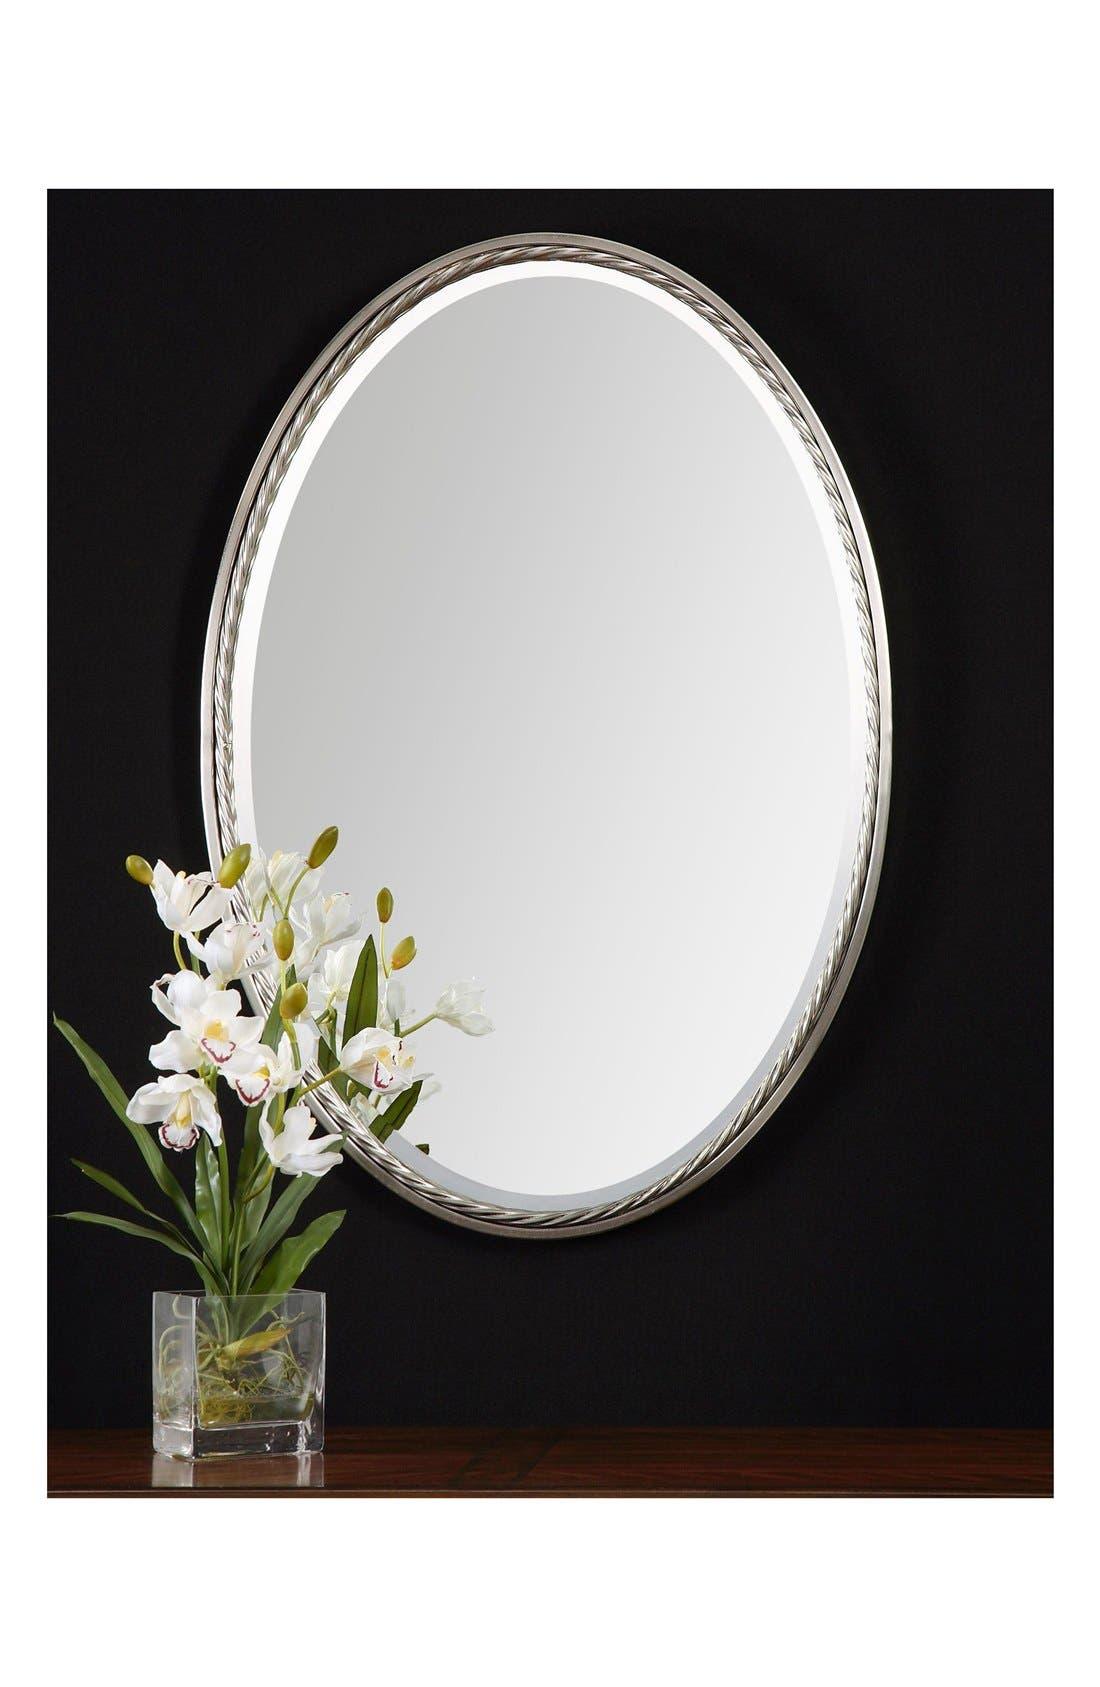 'Casalina' Oval Mirror,                             Alternate thumbnail 4, color,                             040